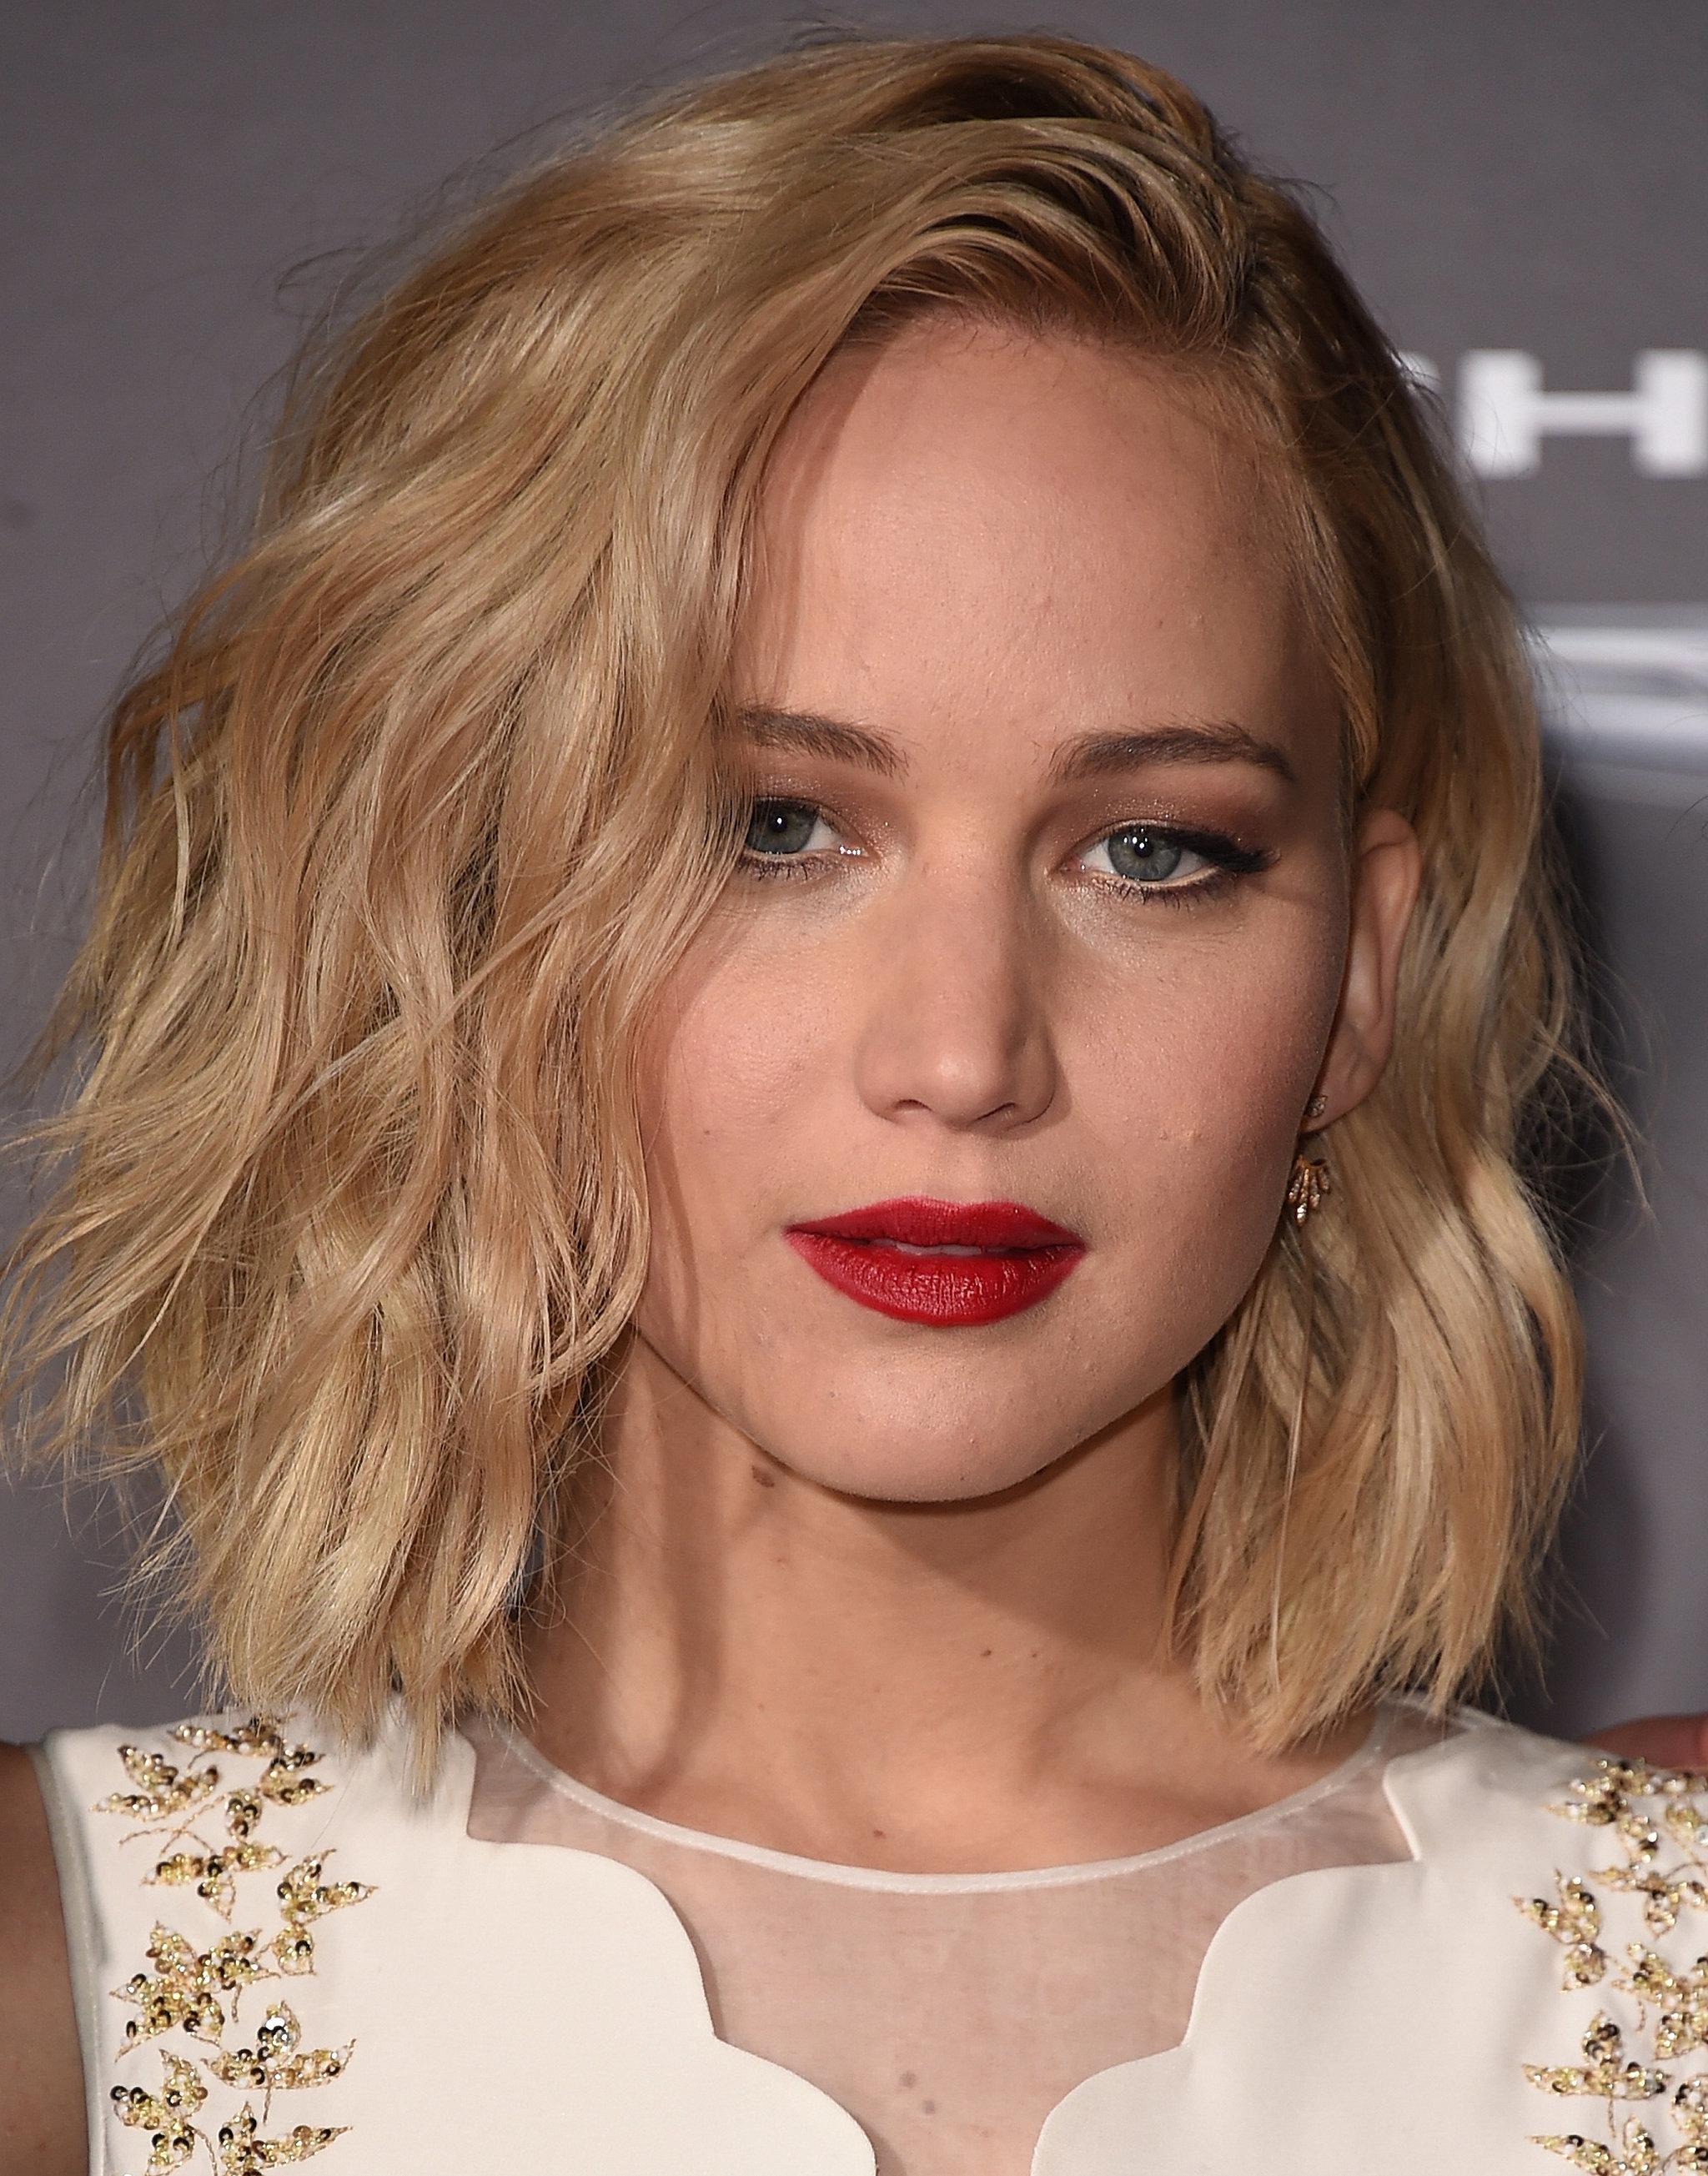 Makeup Beauty Hair Amp Skin Was 2015 Jennifer Lawrence S